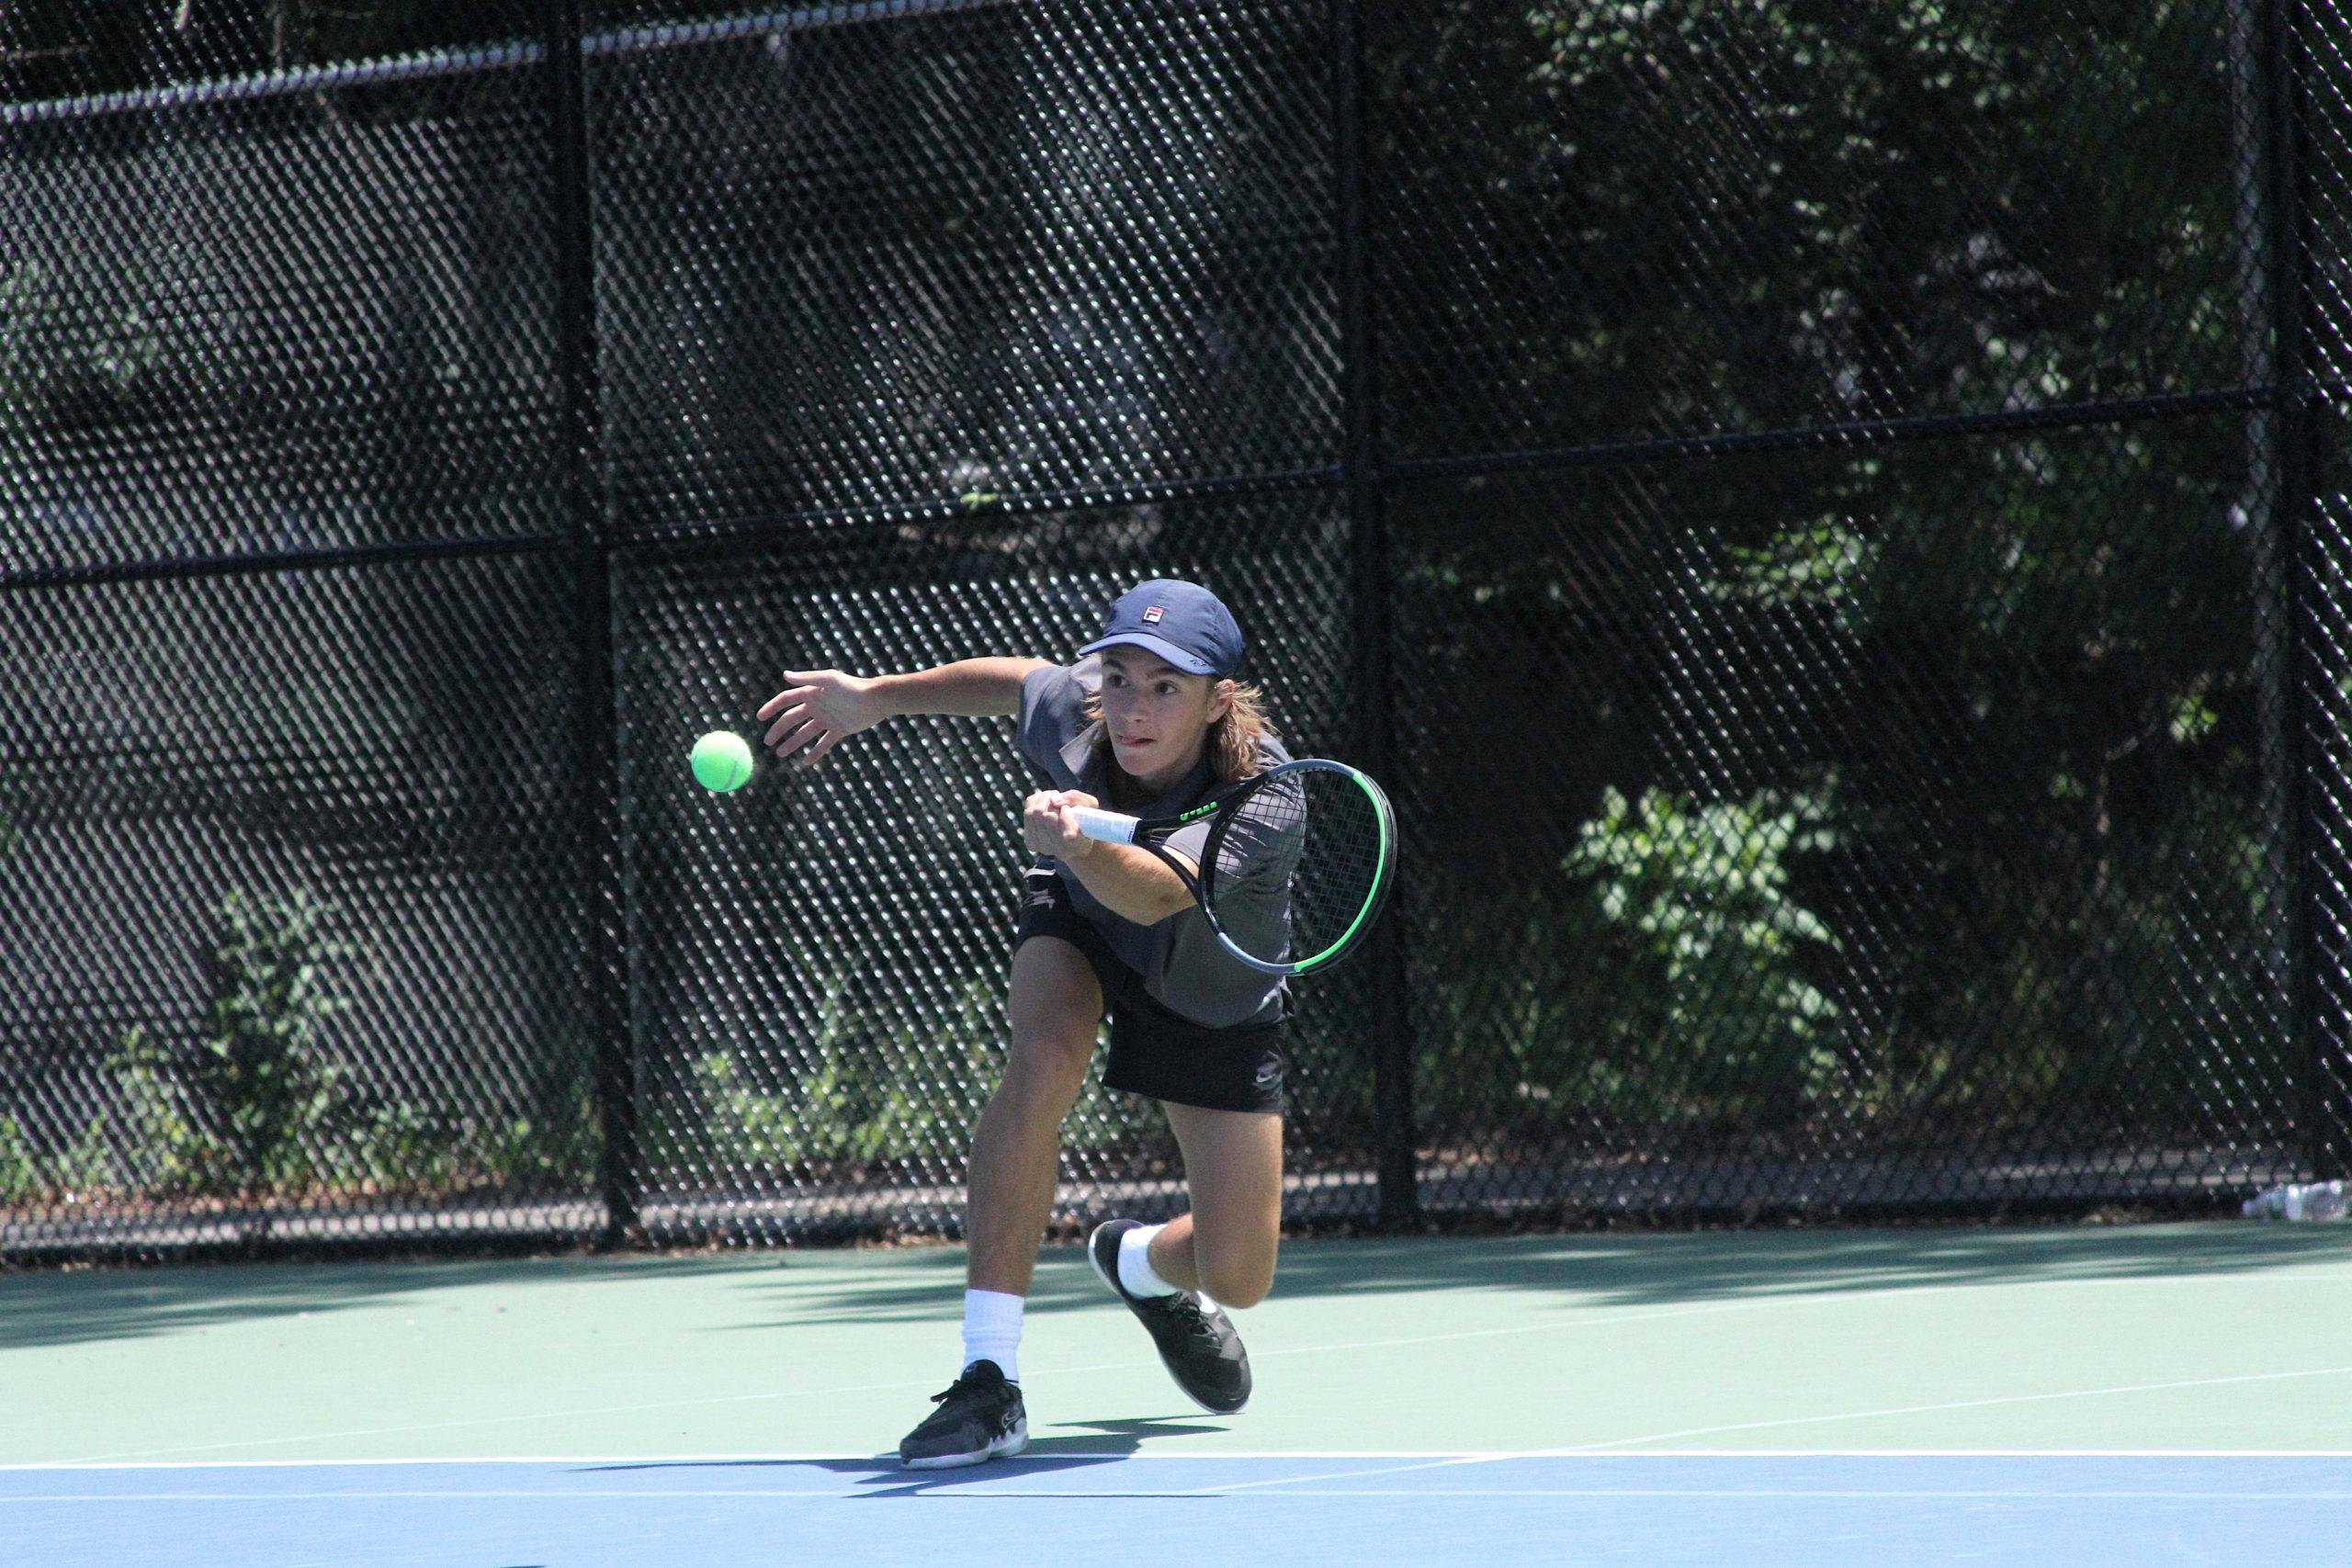 East Hampton sophomore Max Astilean returns a serve in the quarterfinals of the Suffolk County individual tennis tournament June 11. DESIRÉE KEEGAN